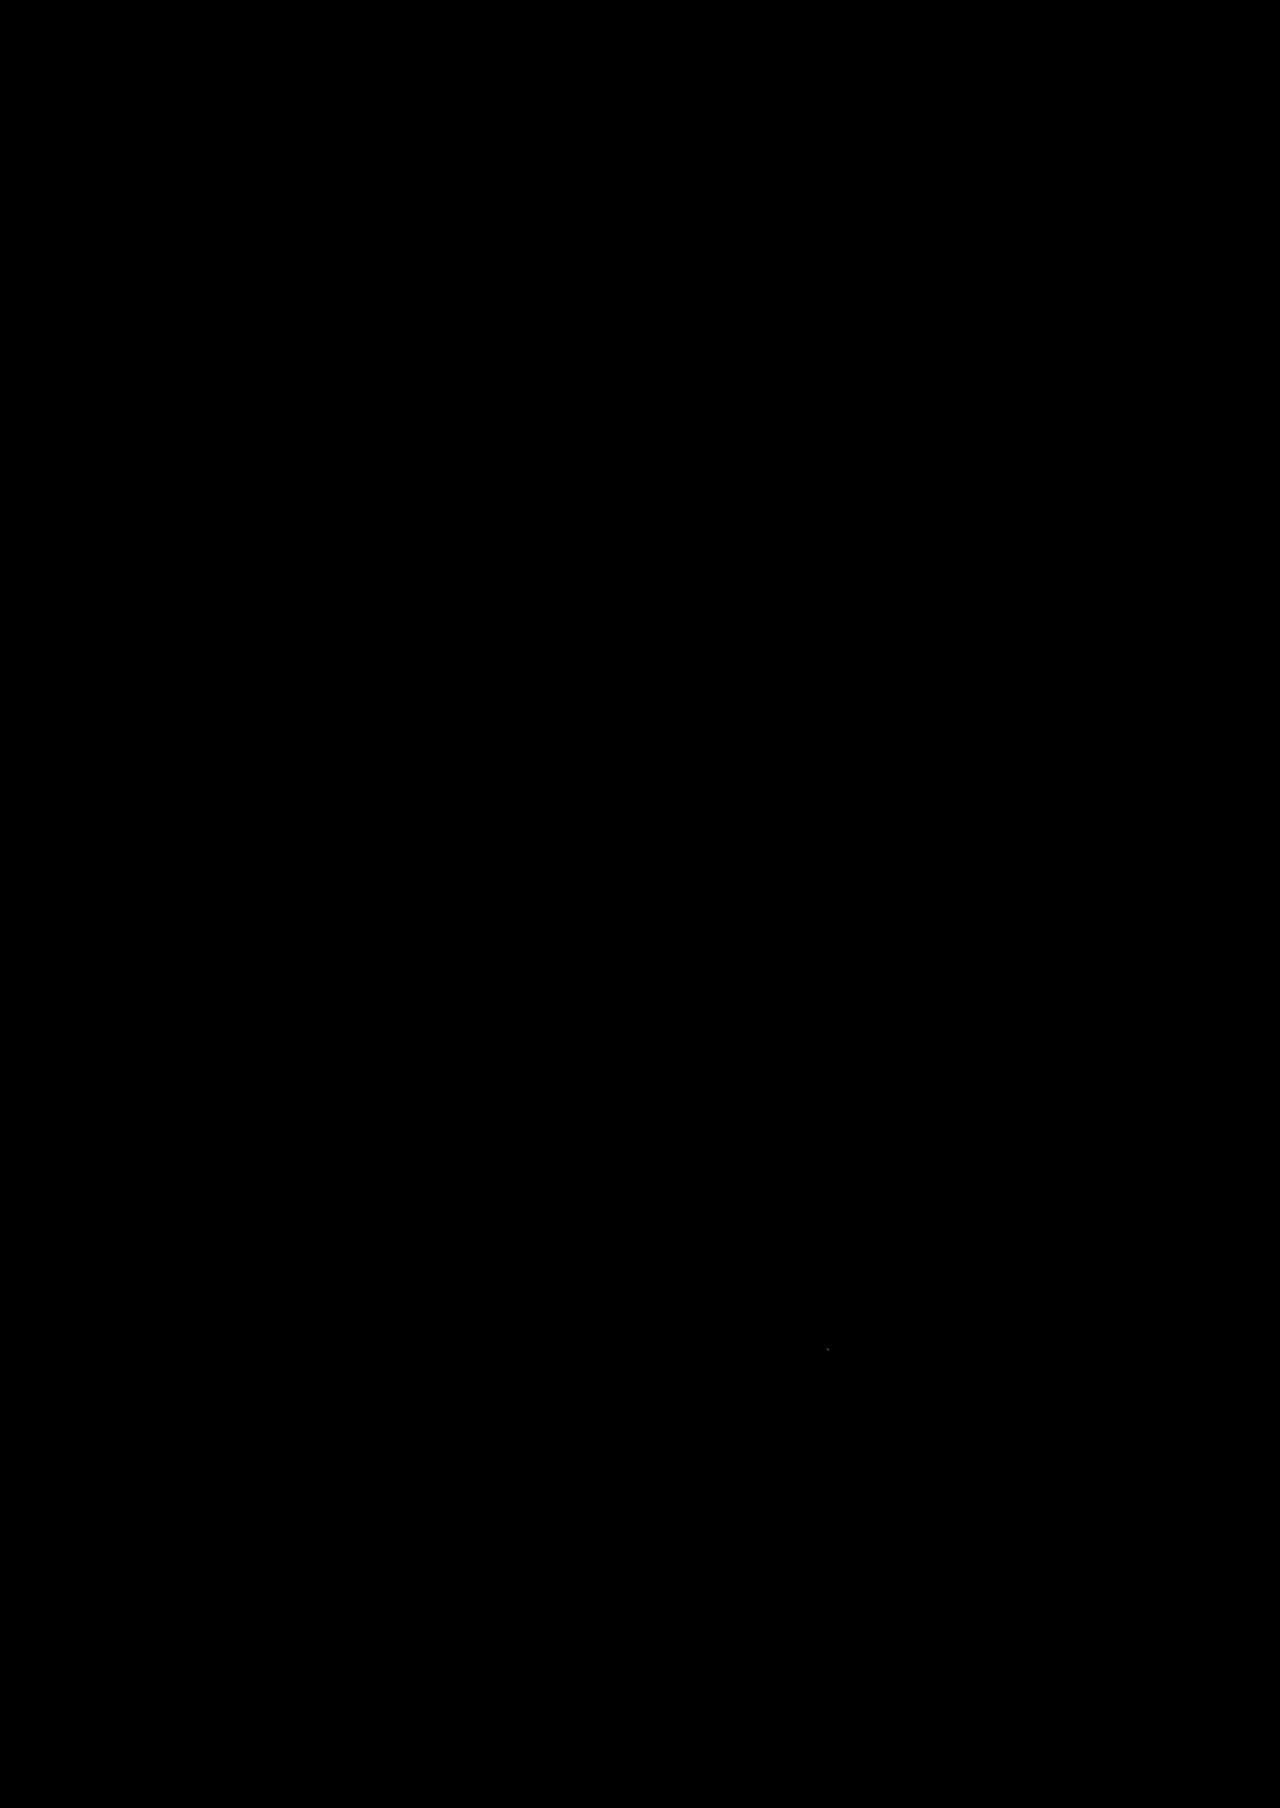 [Eromazun (Ma-kurou)] Shibuya Rin, Ochiru ~Ossan ga Shibuya Rin to Enkou Sex~   Shibuya Rin Falls ~An Old Guy Has Paid Sex With Shibuya Rin~ (THE IDOLM@STER CINDERELLA GIRLS) [English] [B.E.C. Scans] [Digital] 13